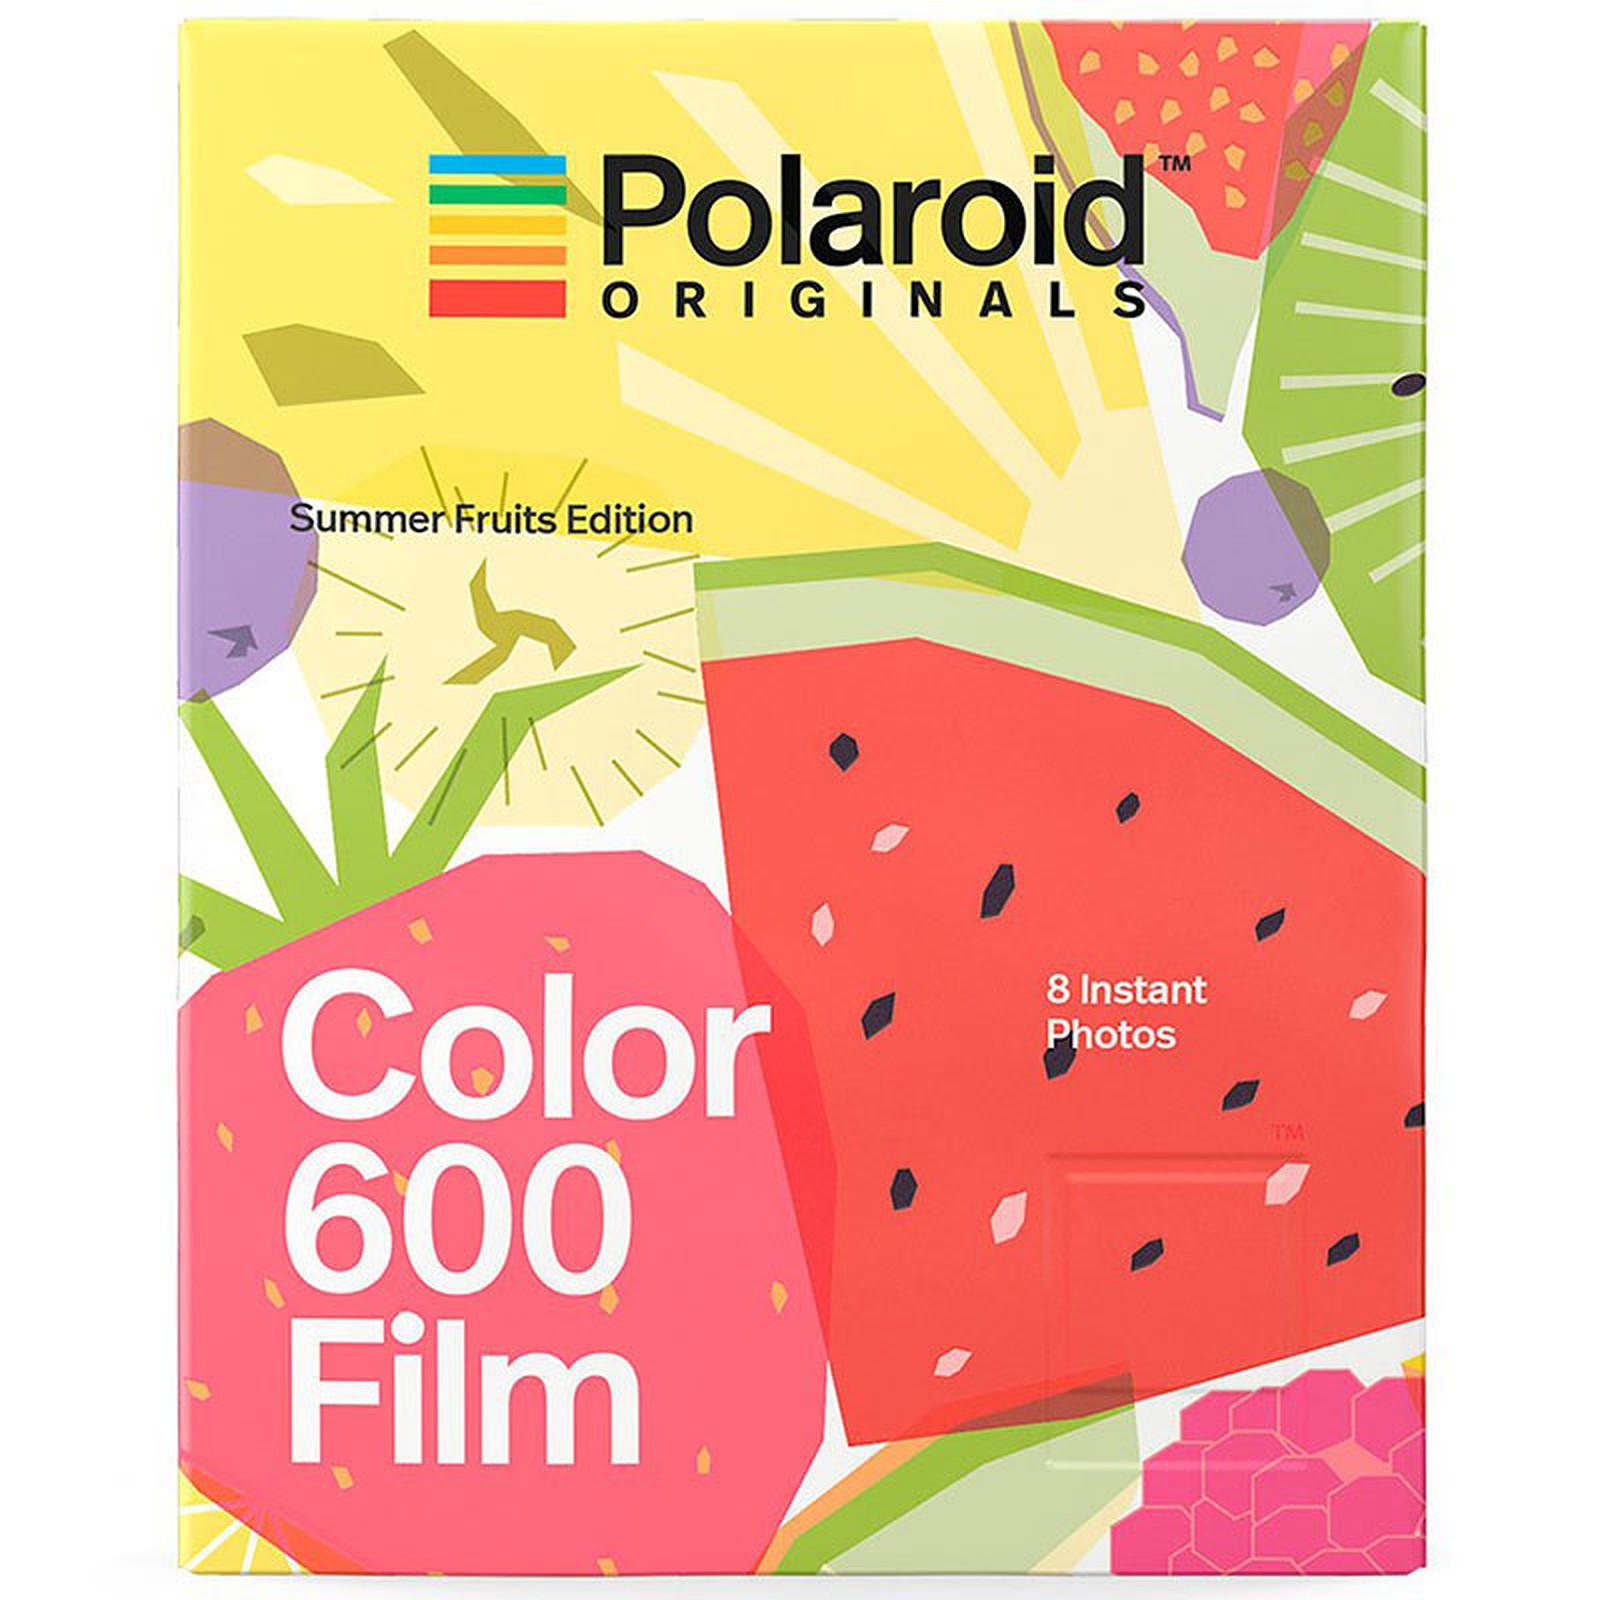 Polaroid Color 600 Film Summer Fruits